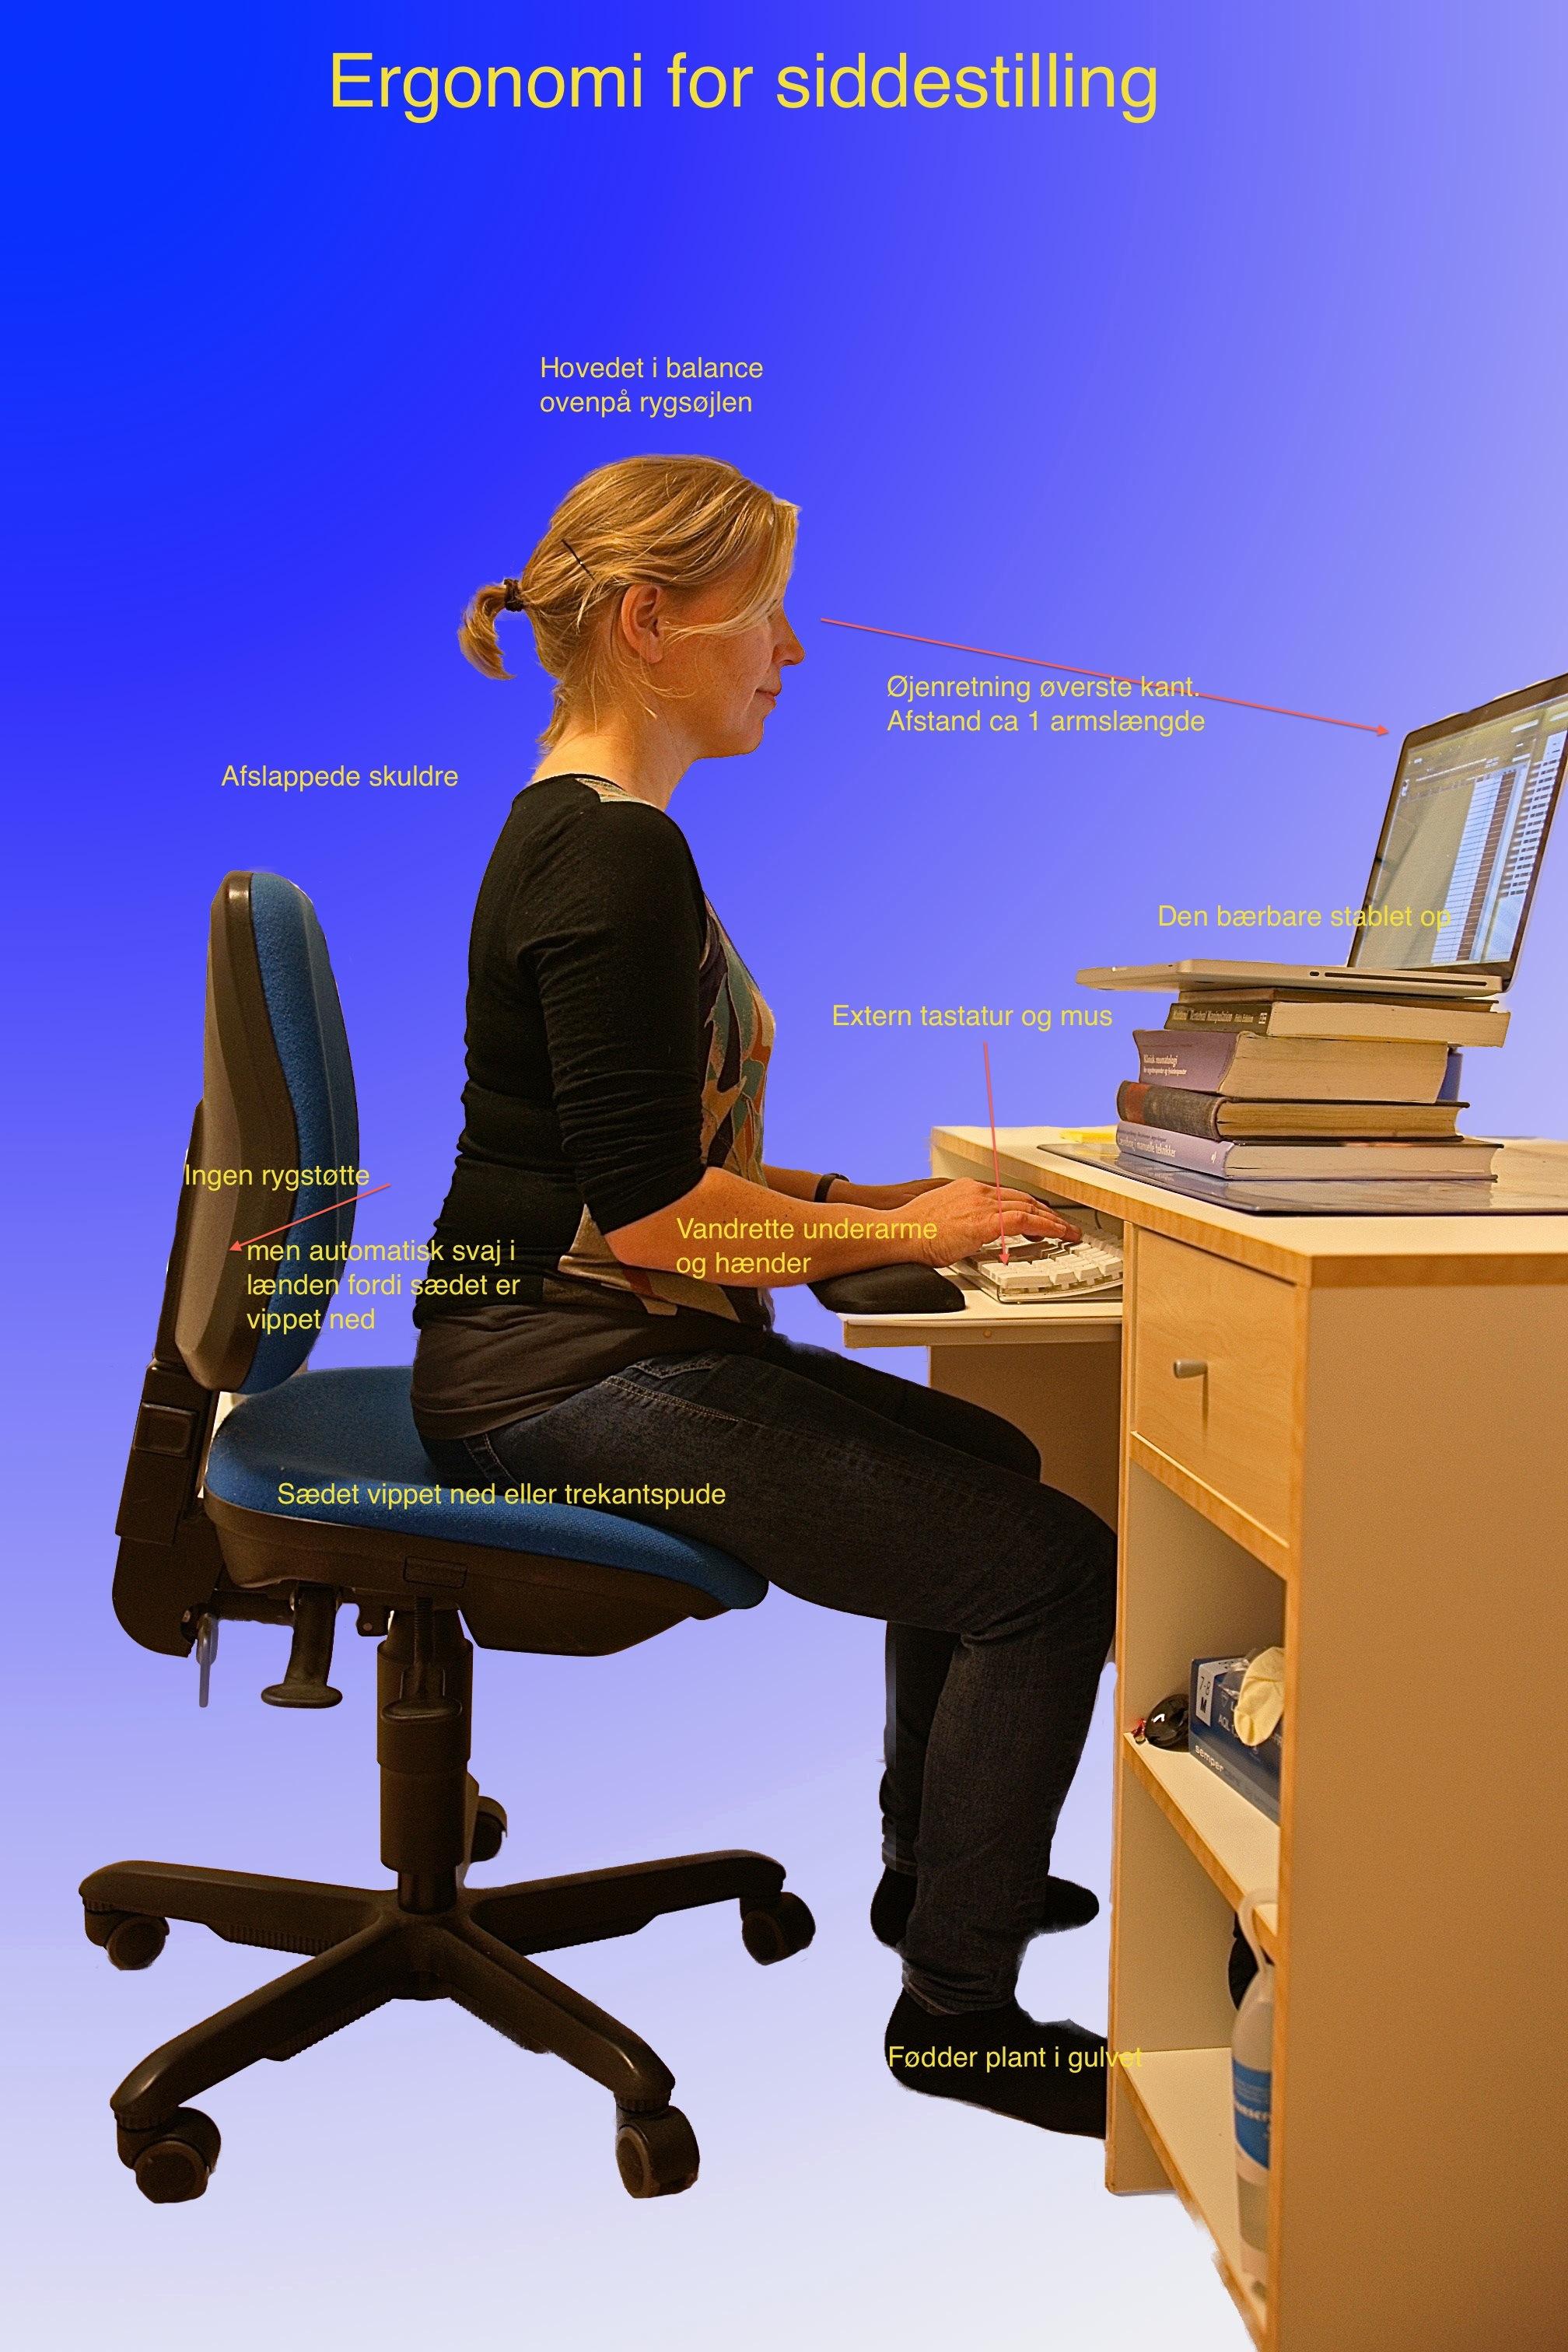 Ergonomisk korrekt siddestilling